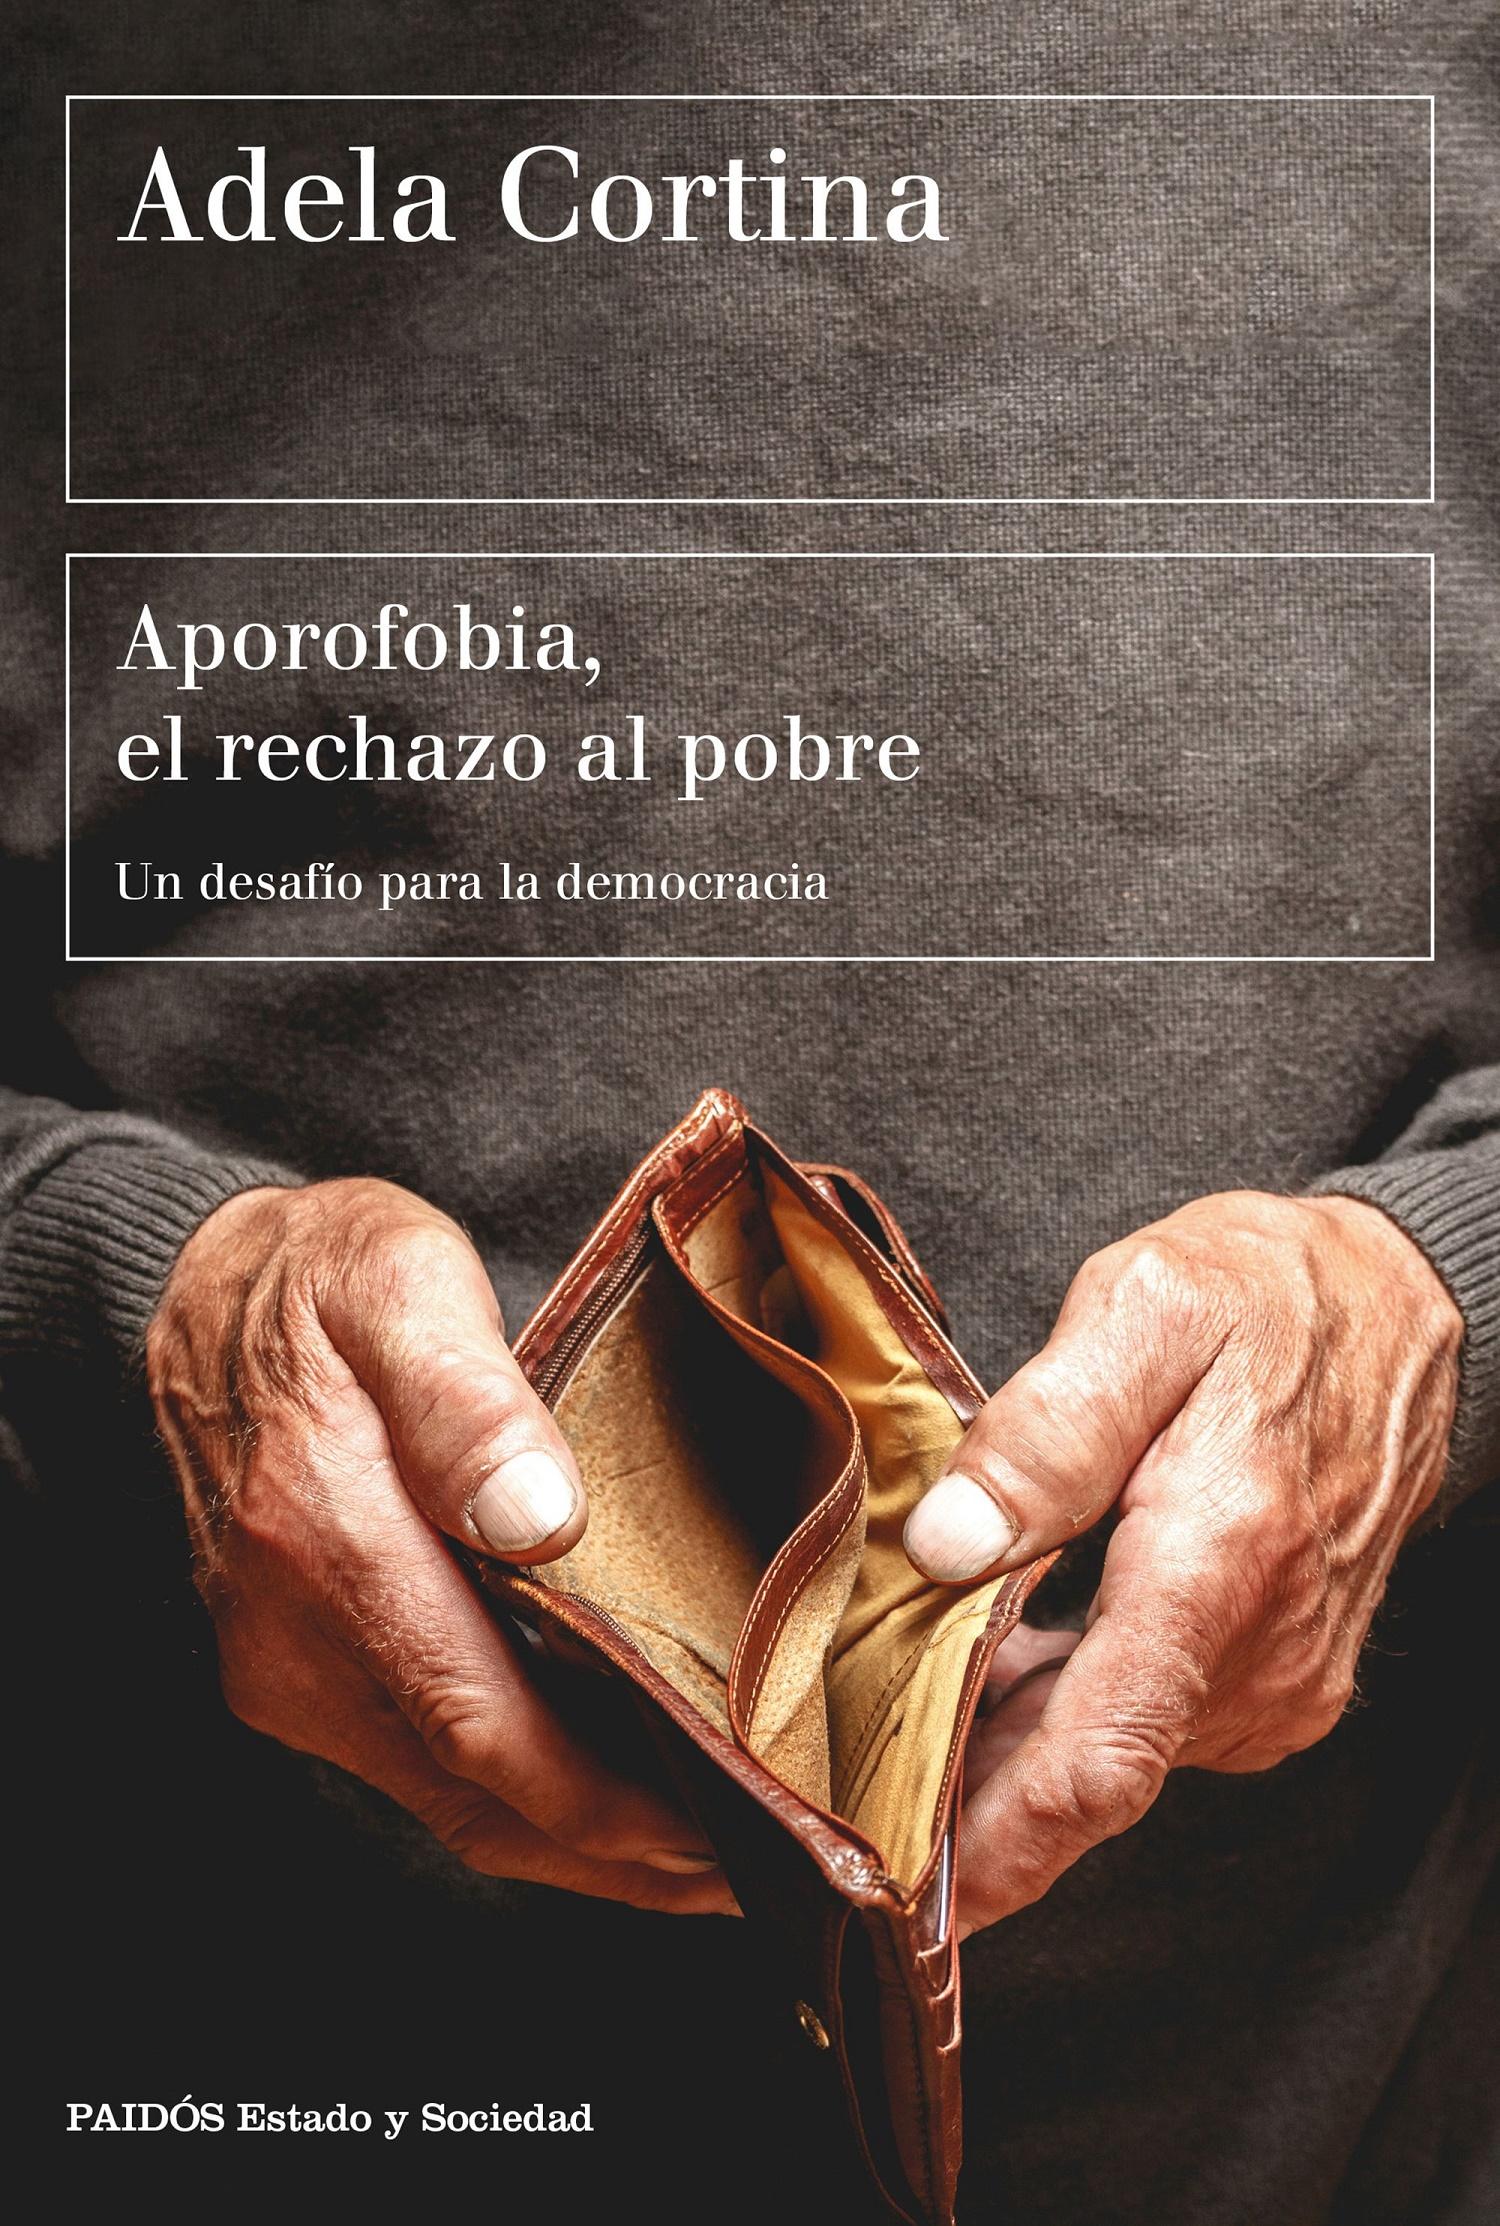 Aporofobia El Rechazo Al Pobre Adela Cortina Orts